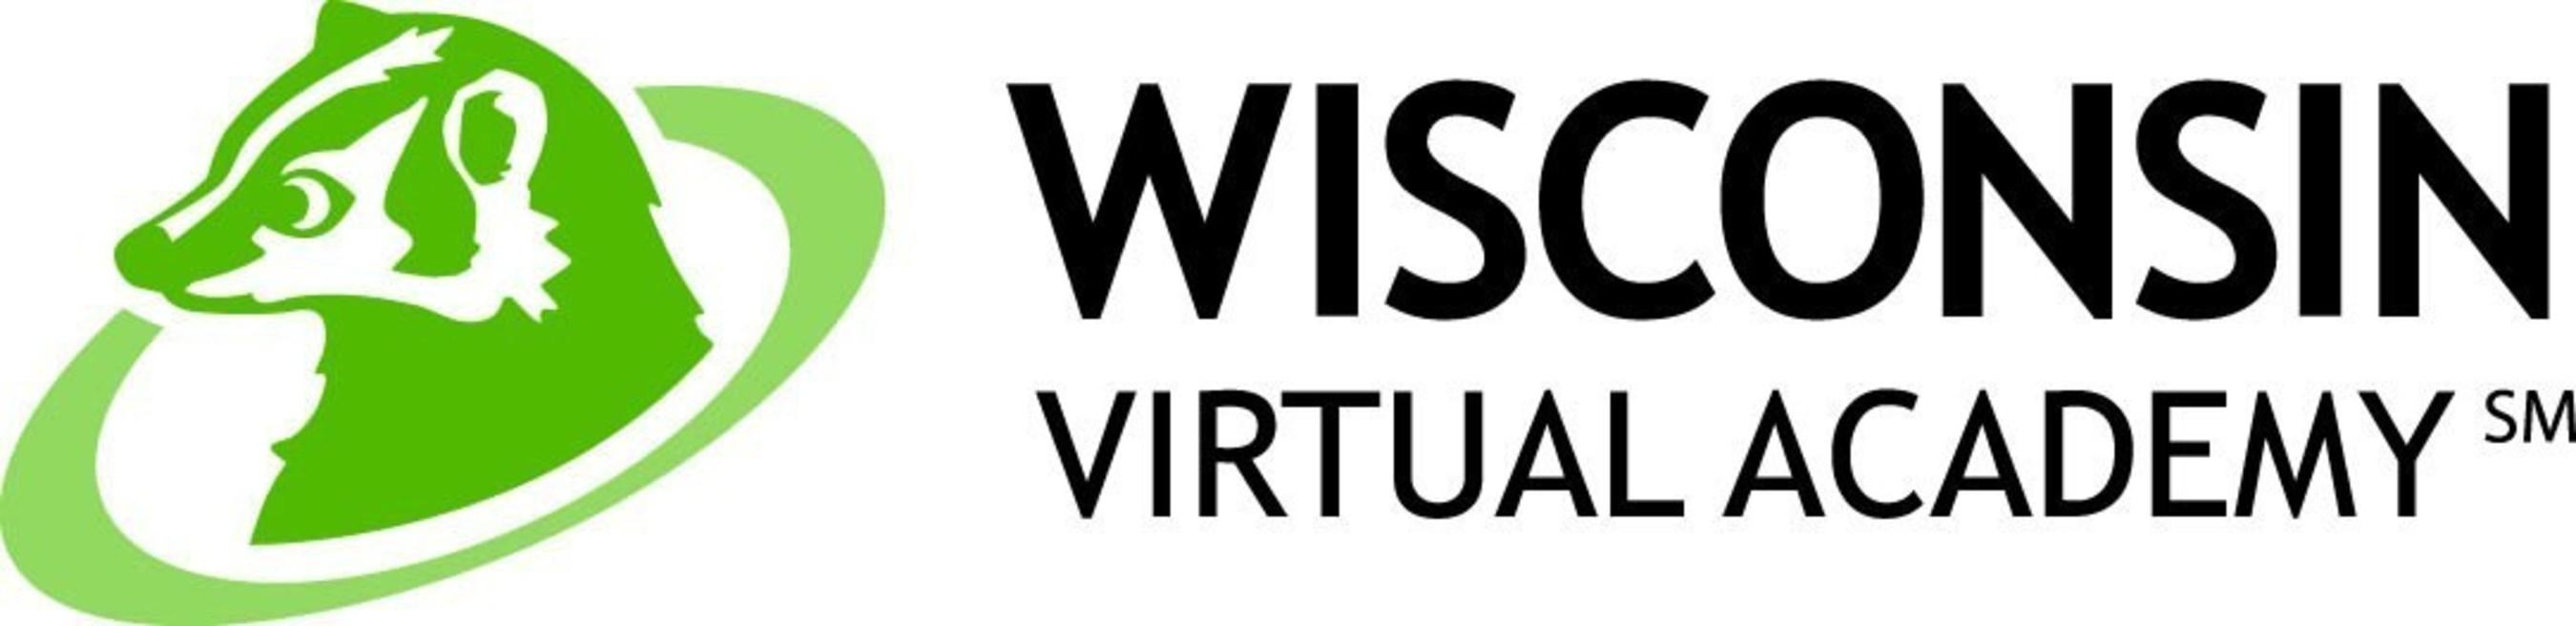 Wisconsin Virtual Academy